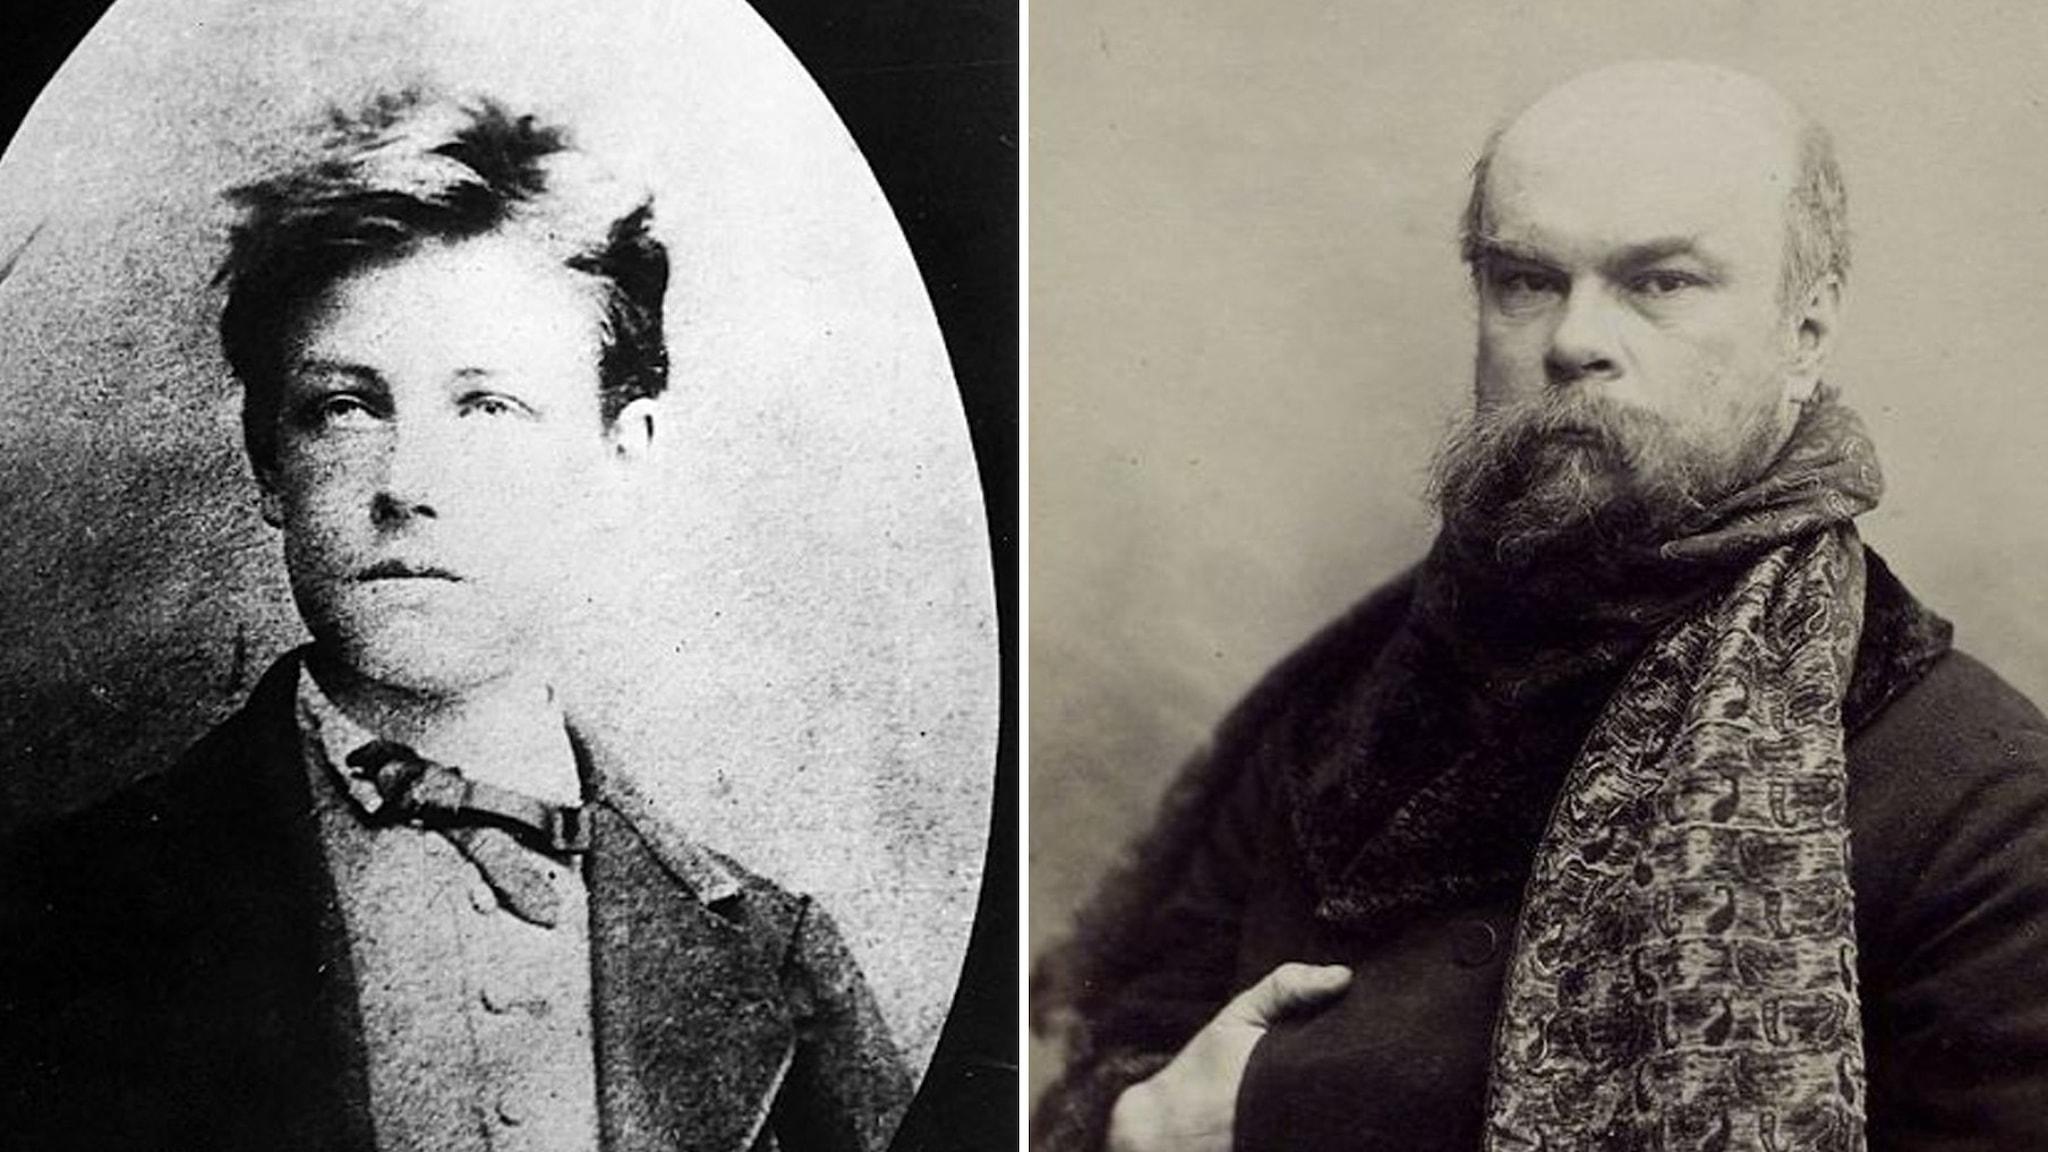 Poeterna Artur Rimbaud och Paul Verlaine